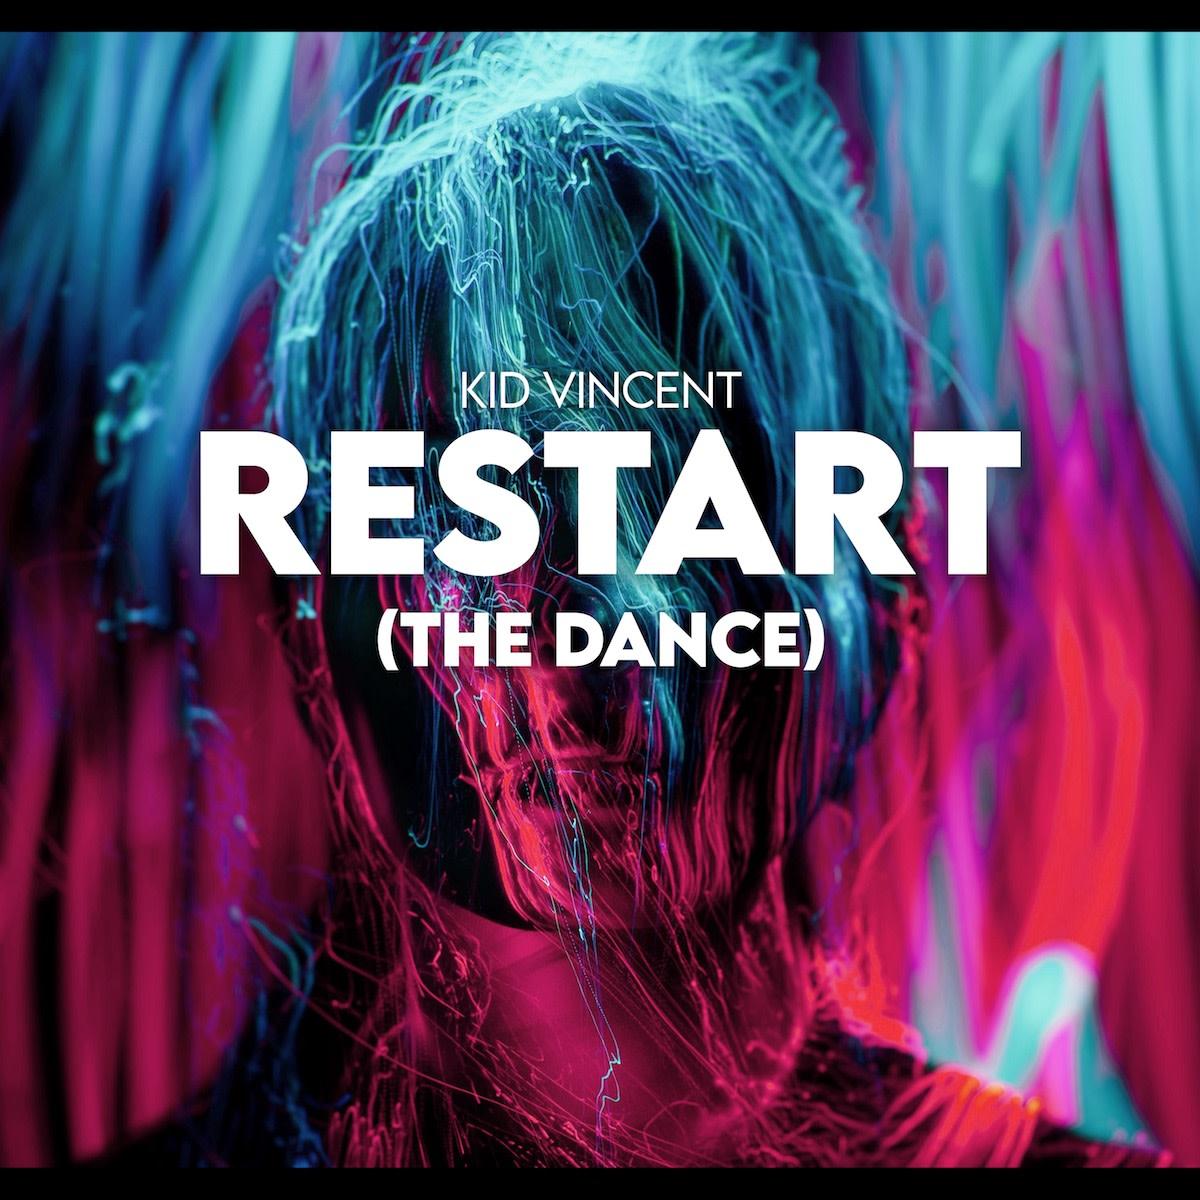 Kid Vincent - Restart (The Dance) (EP Cover 1200x)